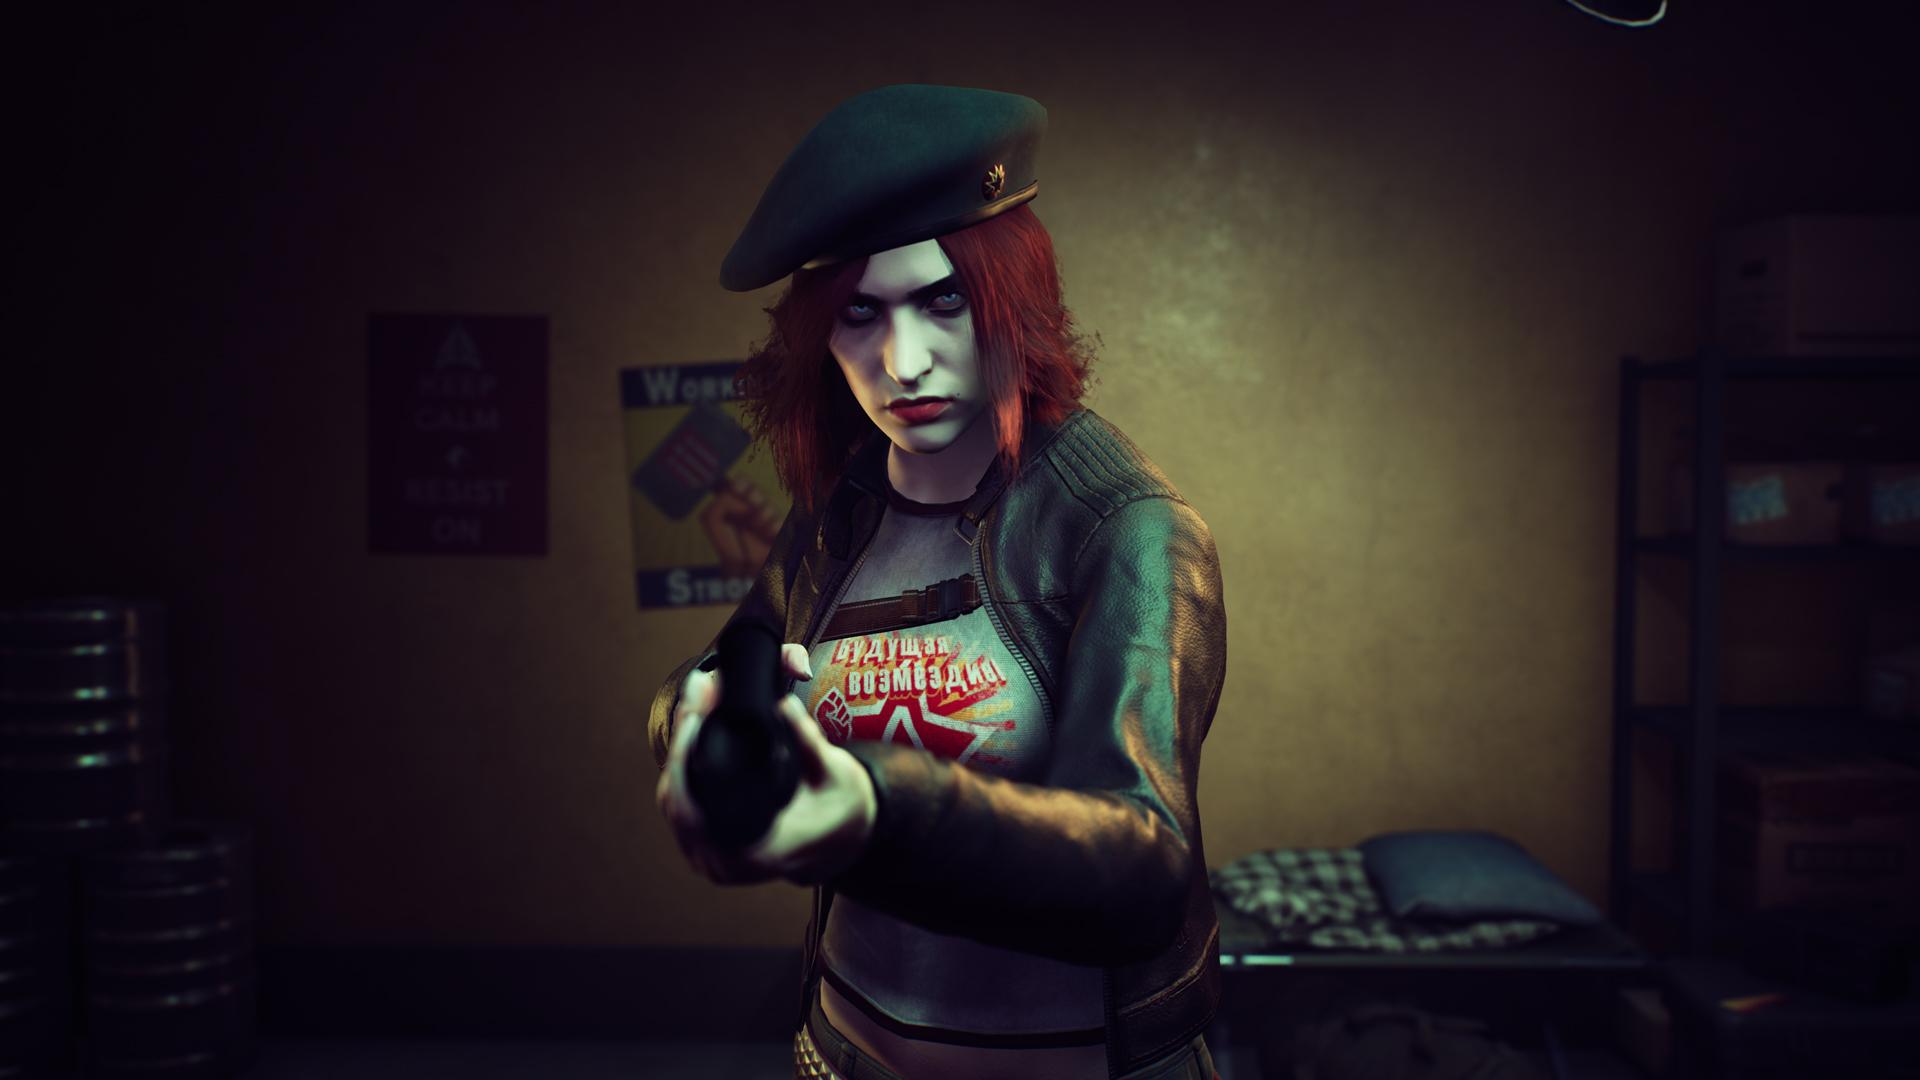 VampireTheMasqueradeBloodlines2 Damsel - Don't expect Vampire: The Masquerade – Bloodlines 2 until the second half of 2021